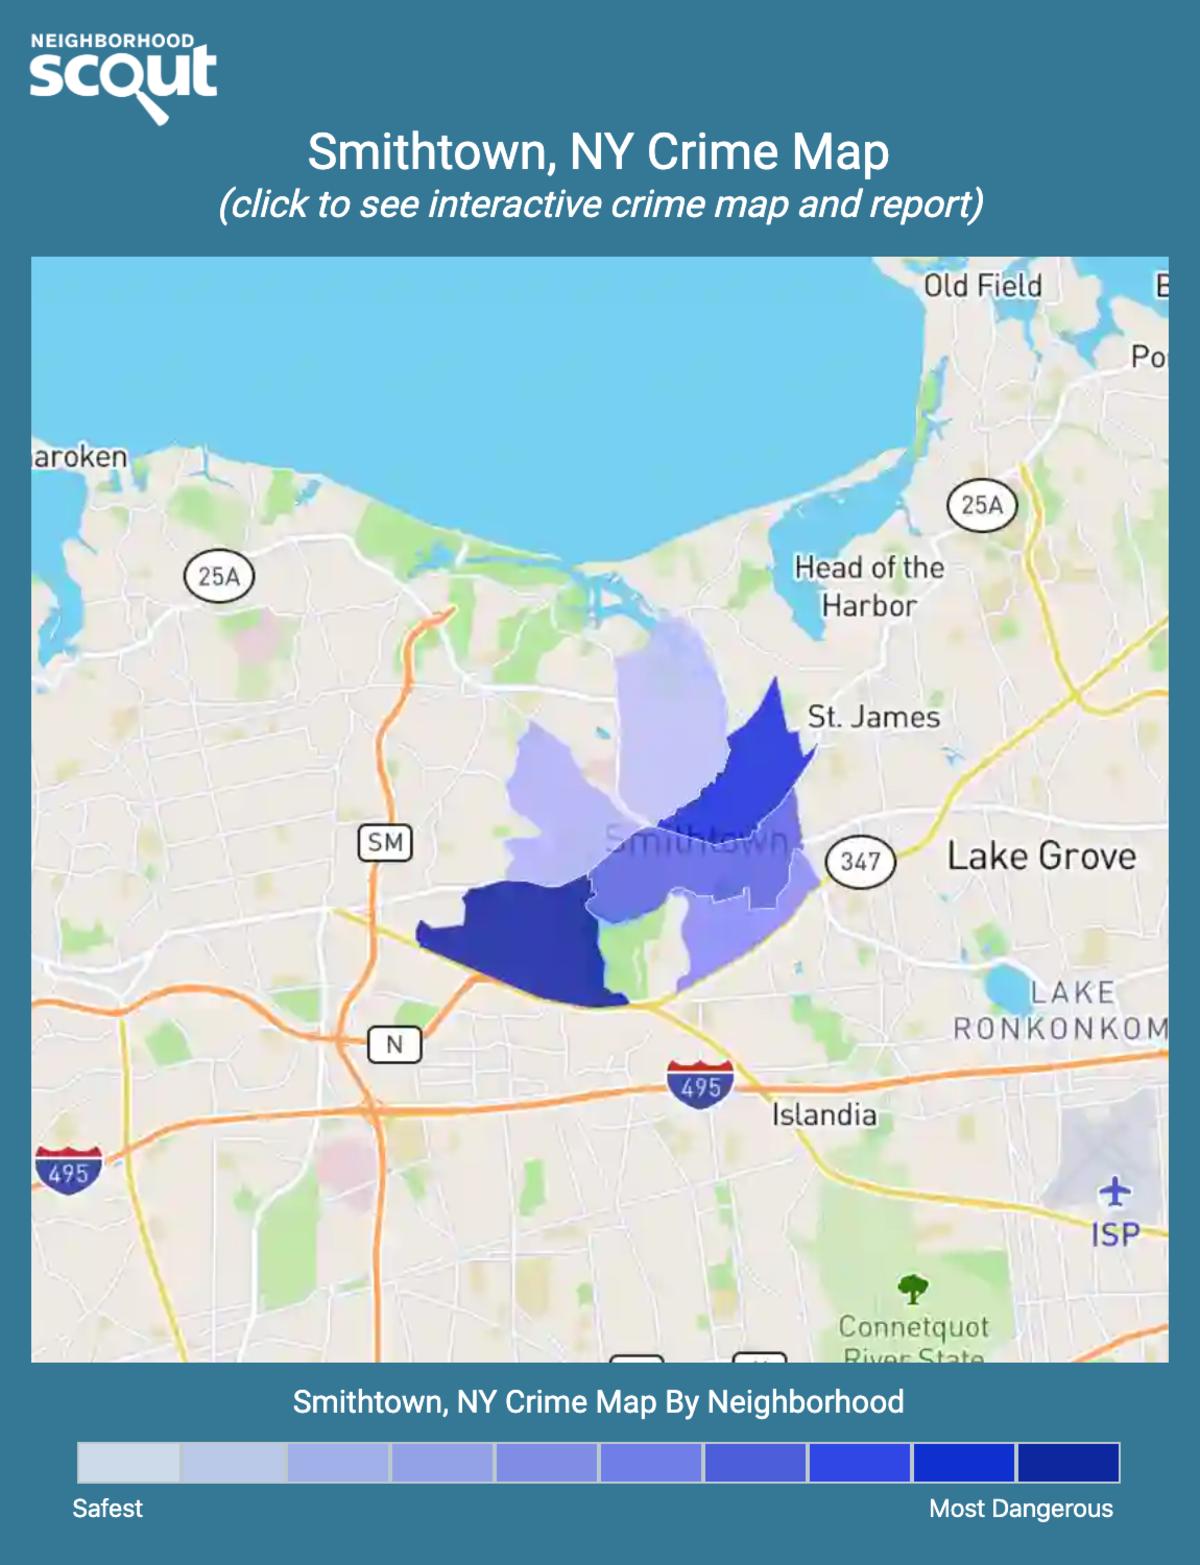 Smithtown, New York crime map